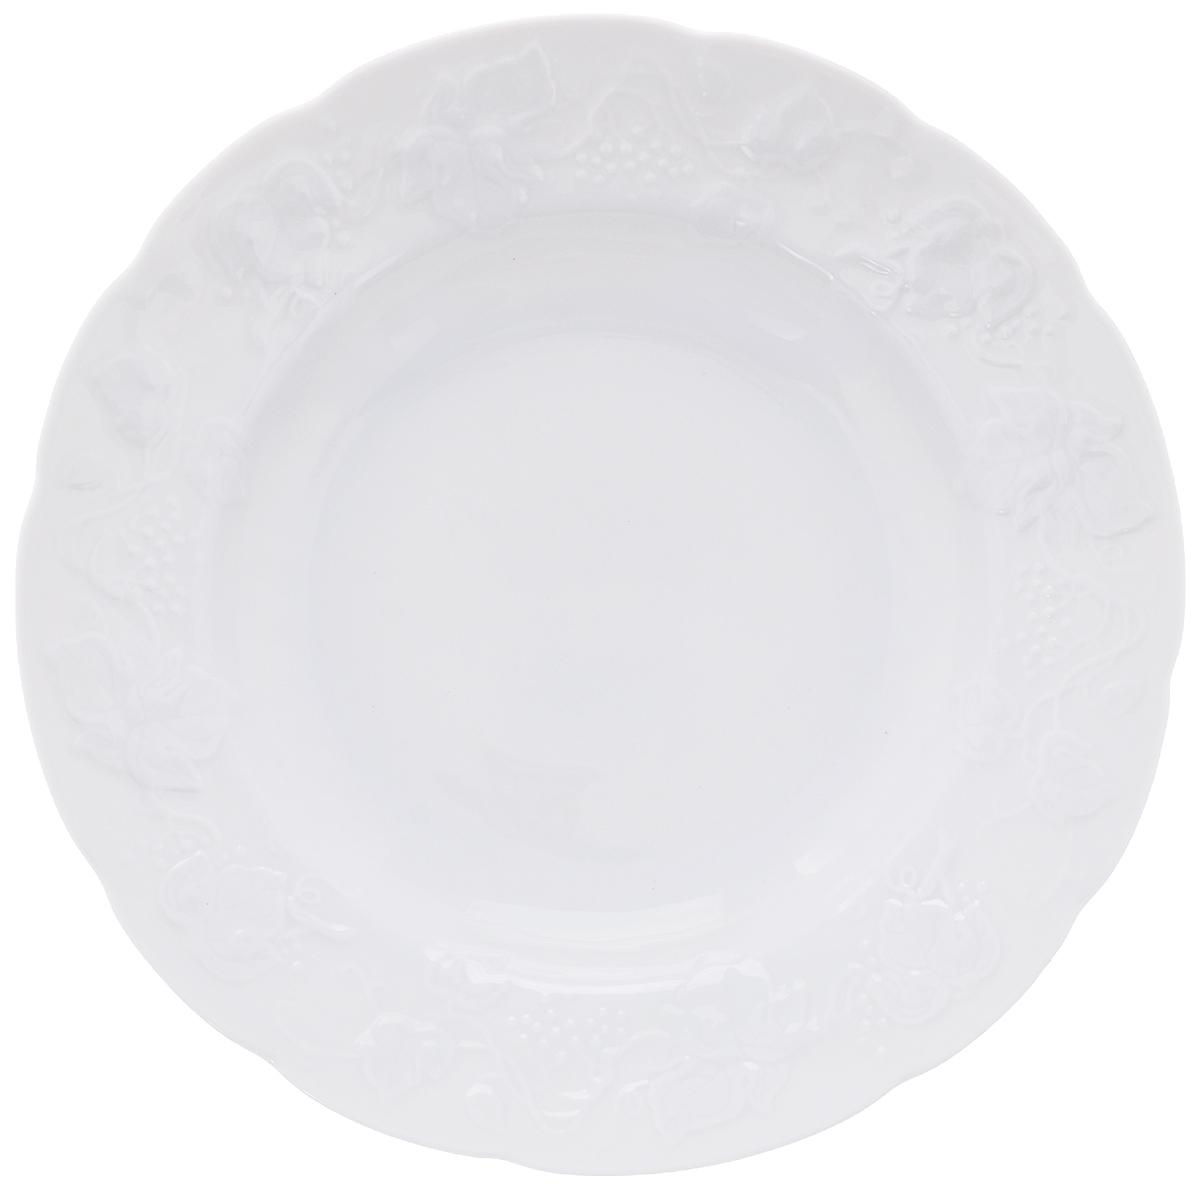 Тарелка десертная Yves De La Rosiere Vendanges, цвет: белый, диаметр 21 см guess oasis w0366g2